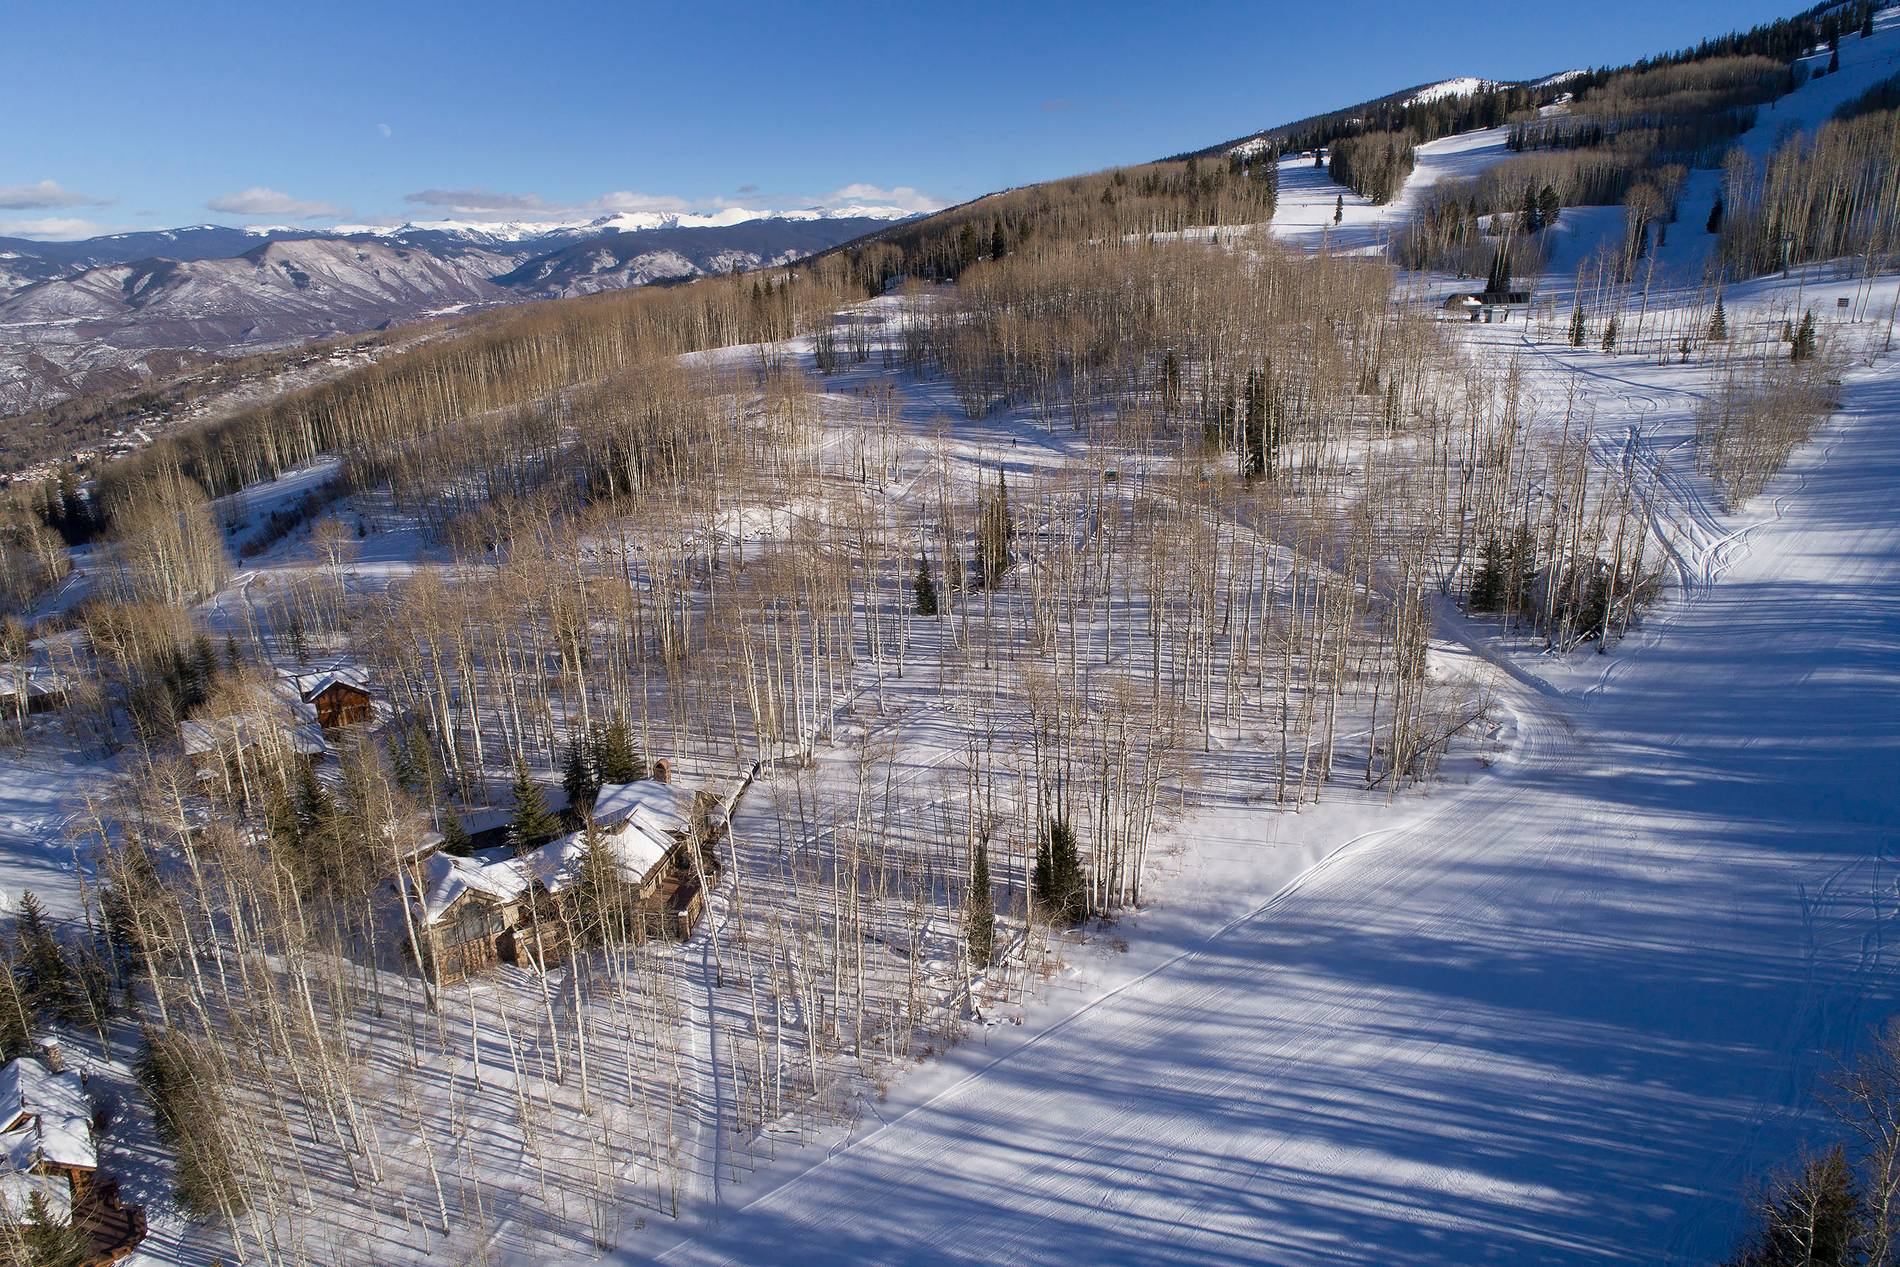 776 Divide Drive Snowmass Village Photo 33